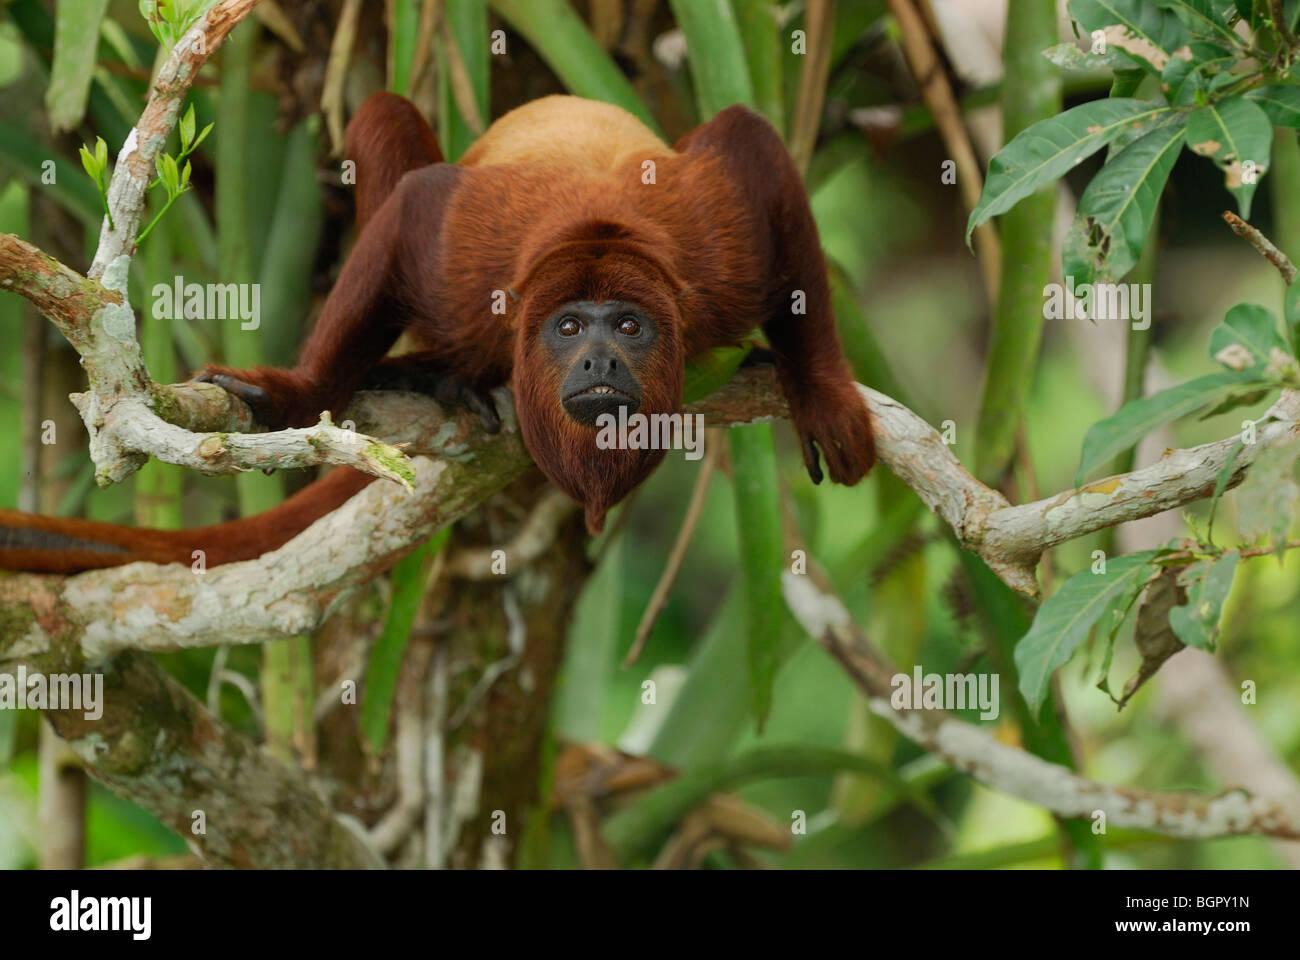 Red Howler Monkey (Alouatta seniculus), adult, Iquitos, Peru - Stock Image